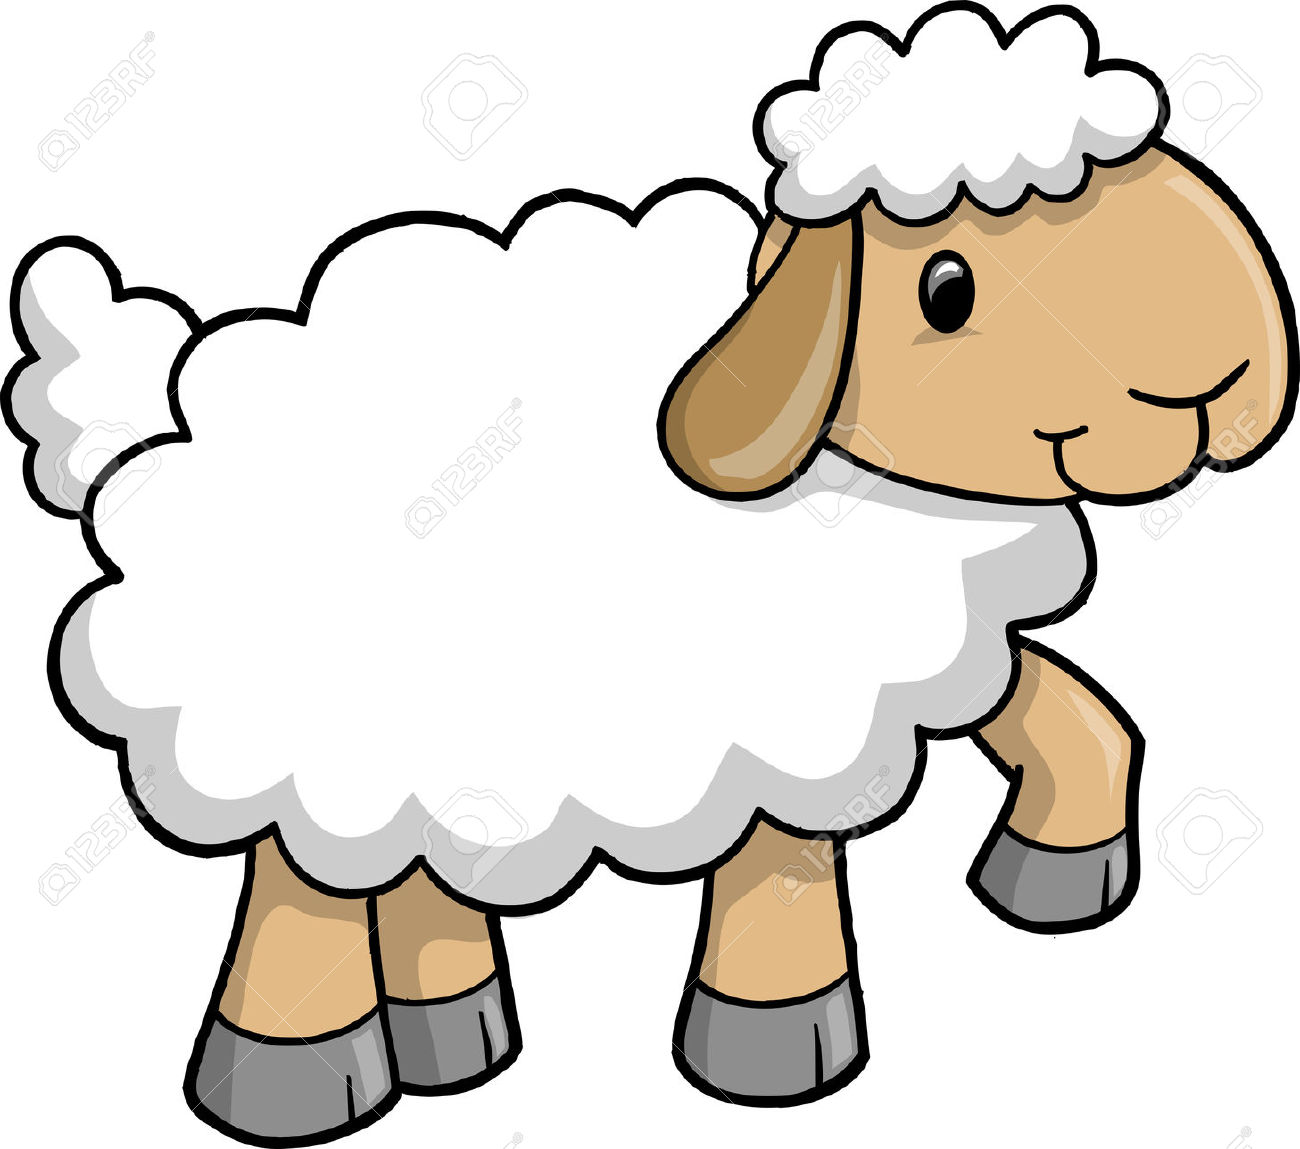 1300x1149 Top 59 Sheep Clip Art